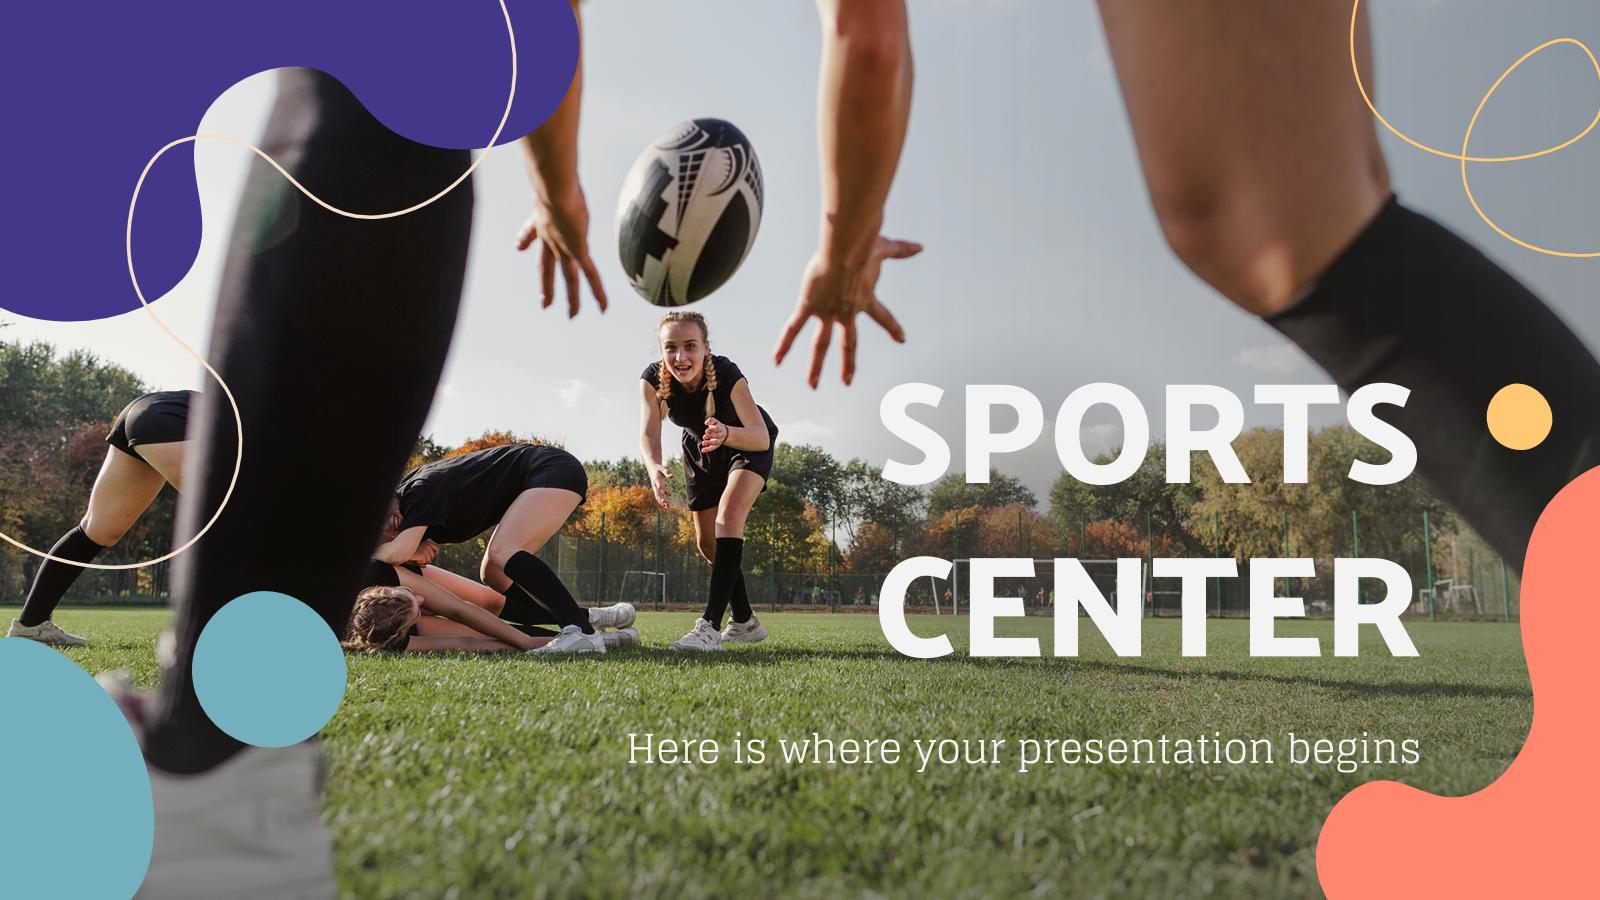 Plantilla de presentación Centro deportivo